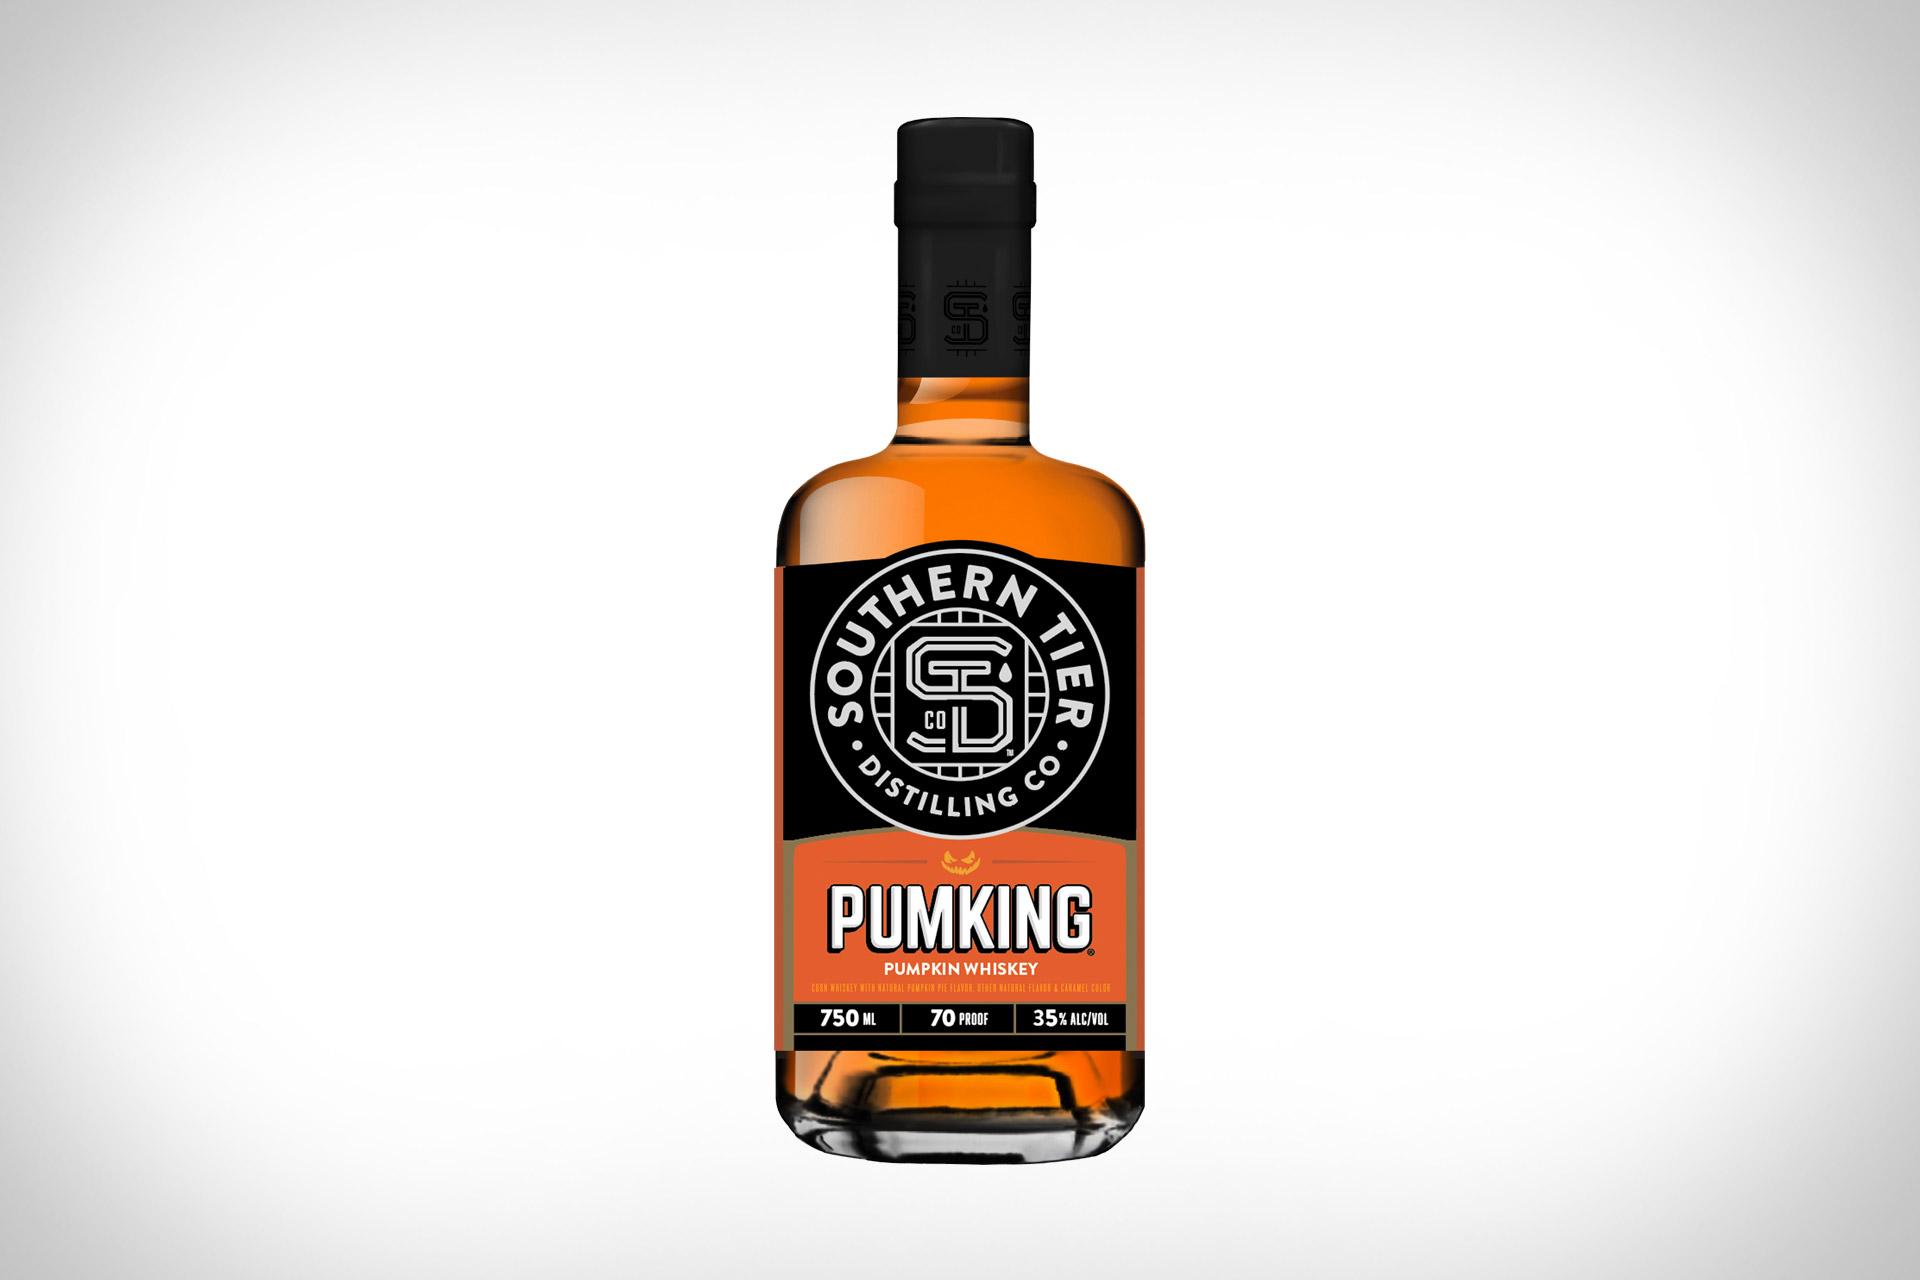 Southern Tier Pumking Pumpkin Whiskey